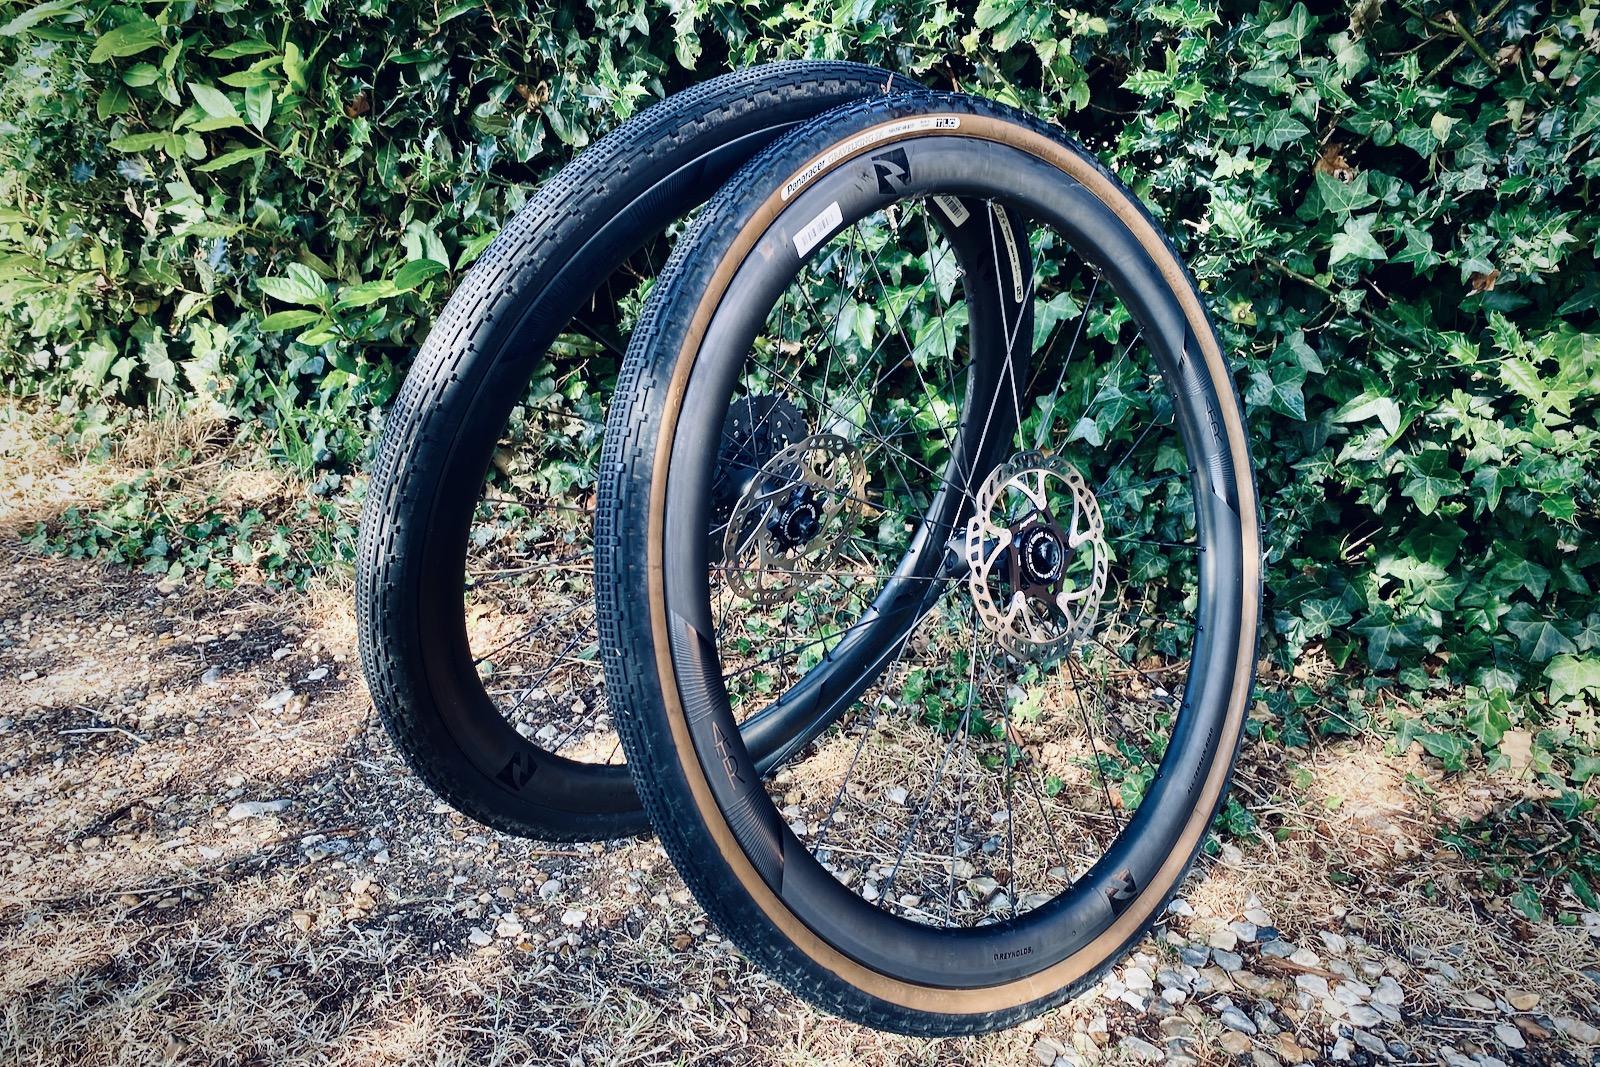 Reynolds Wheels ATR2 Gravel Carbon Wheels